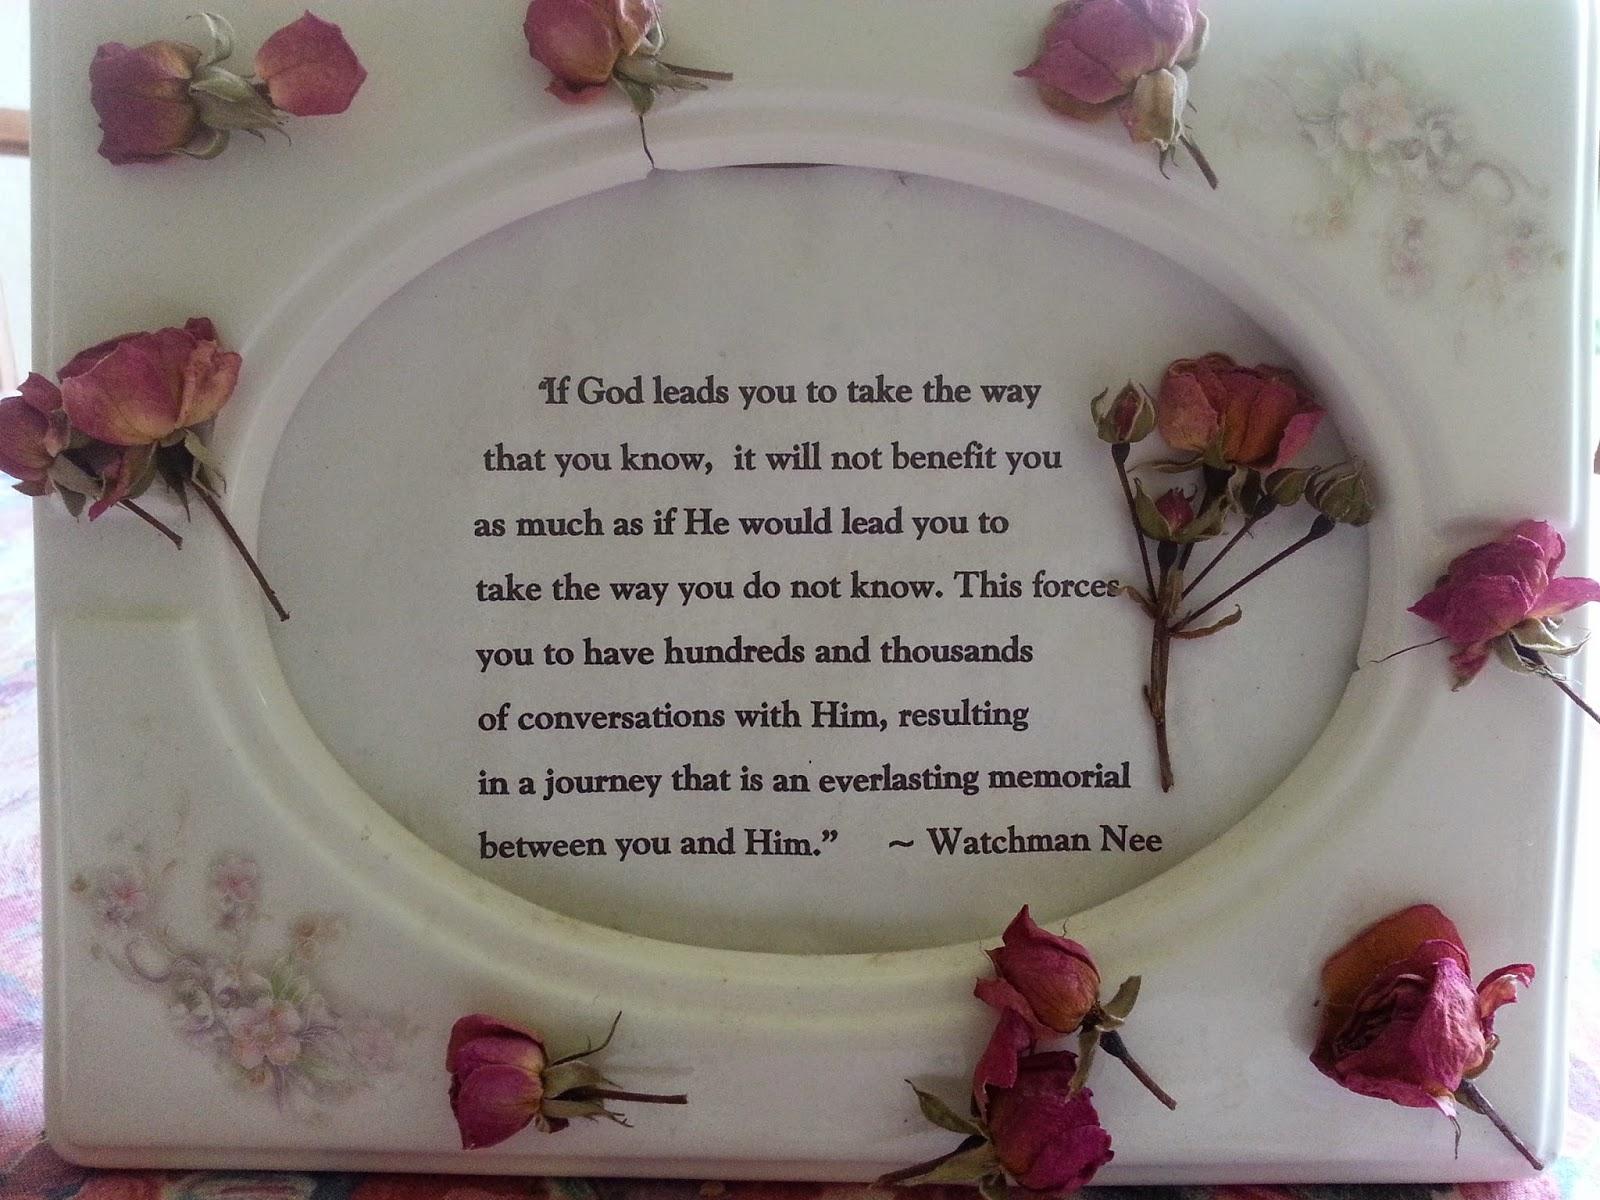 Gluten Free & God Seeking: Inspiring Quotes By Watchman Nee